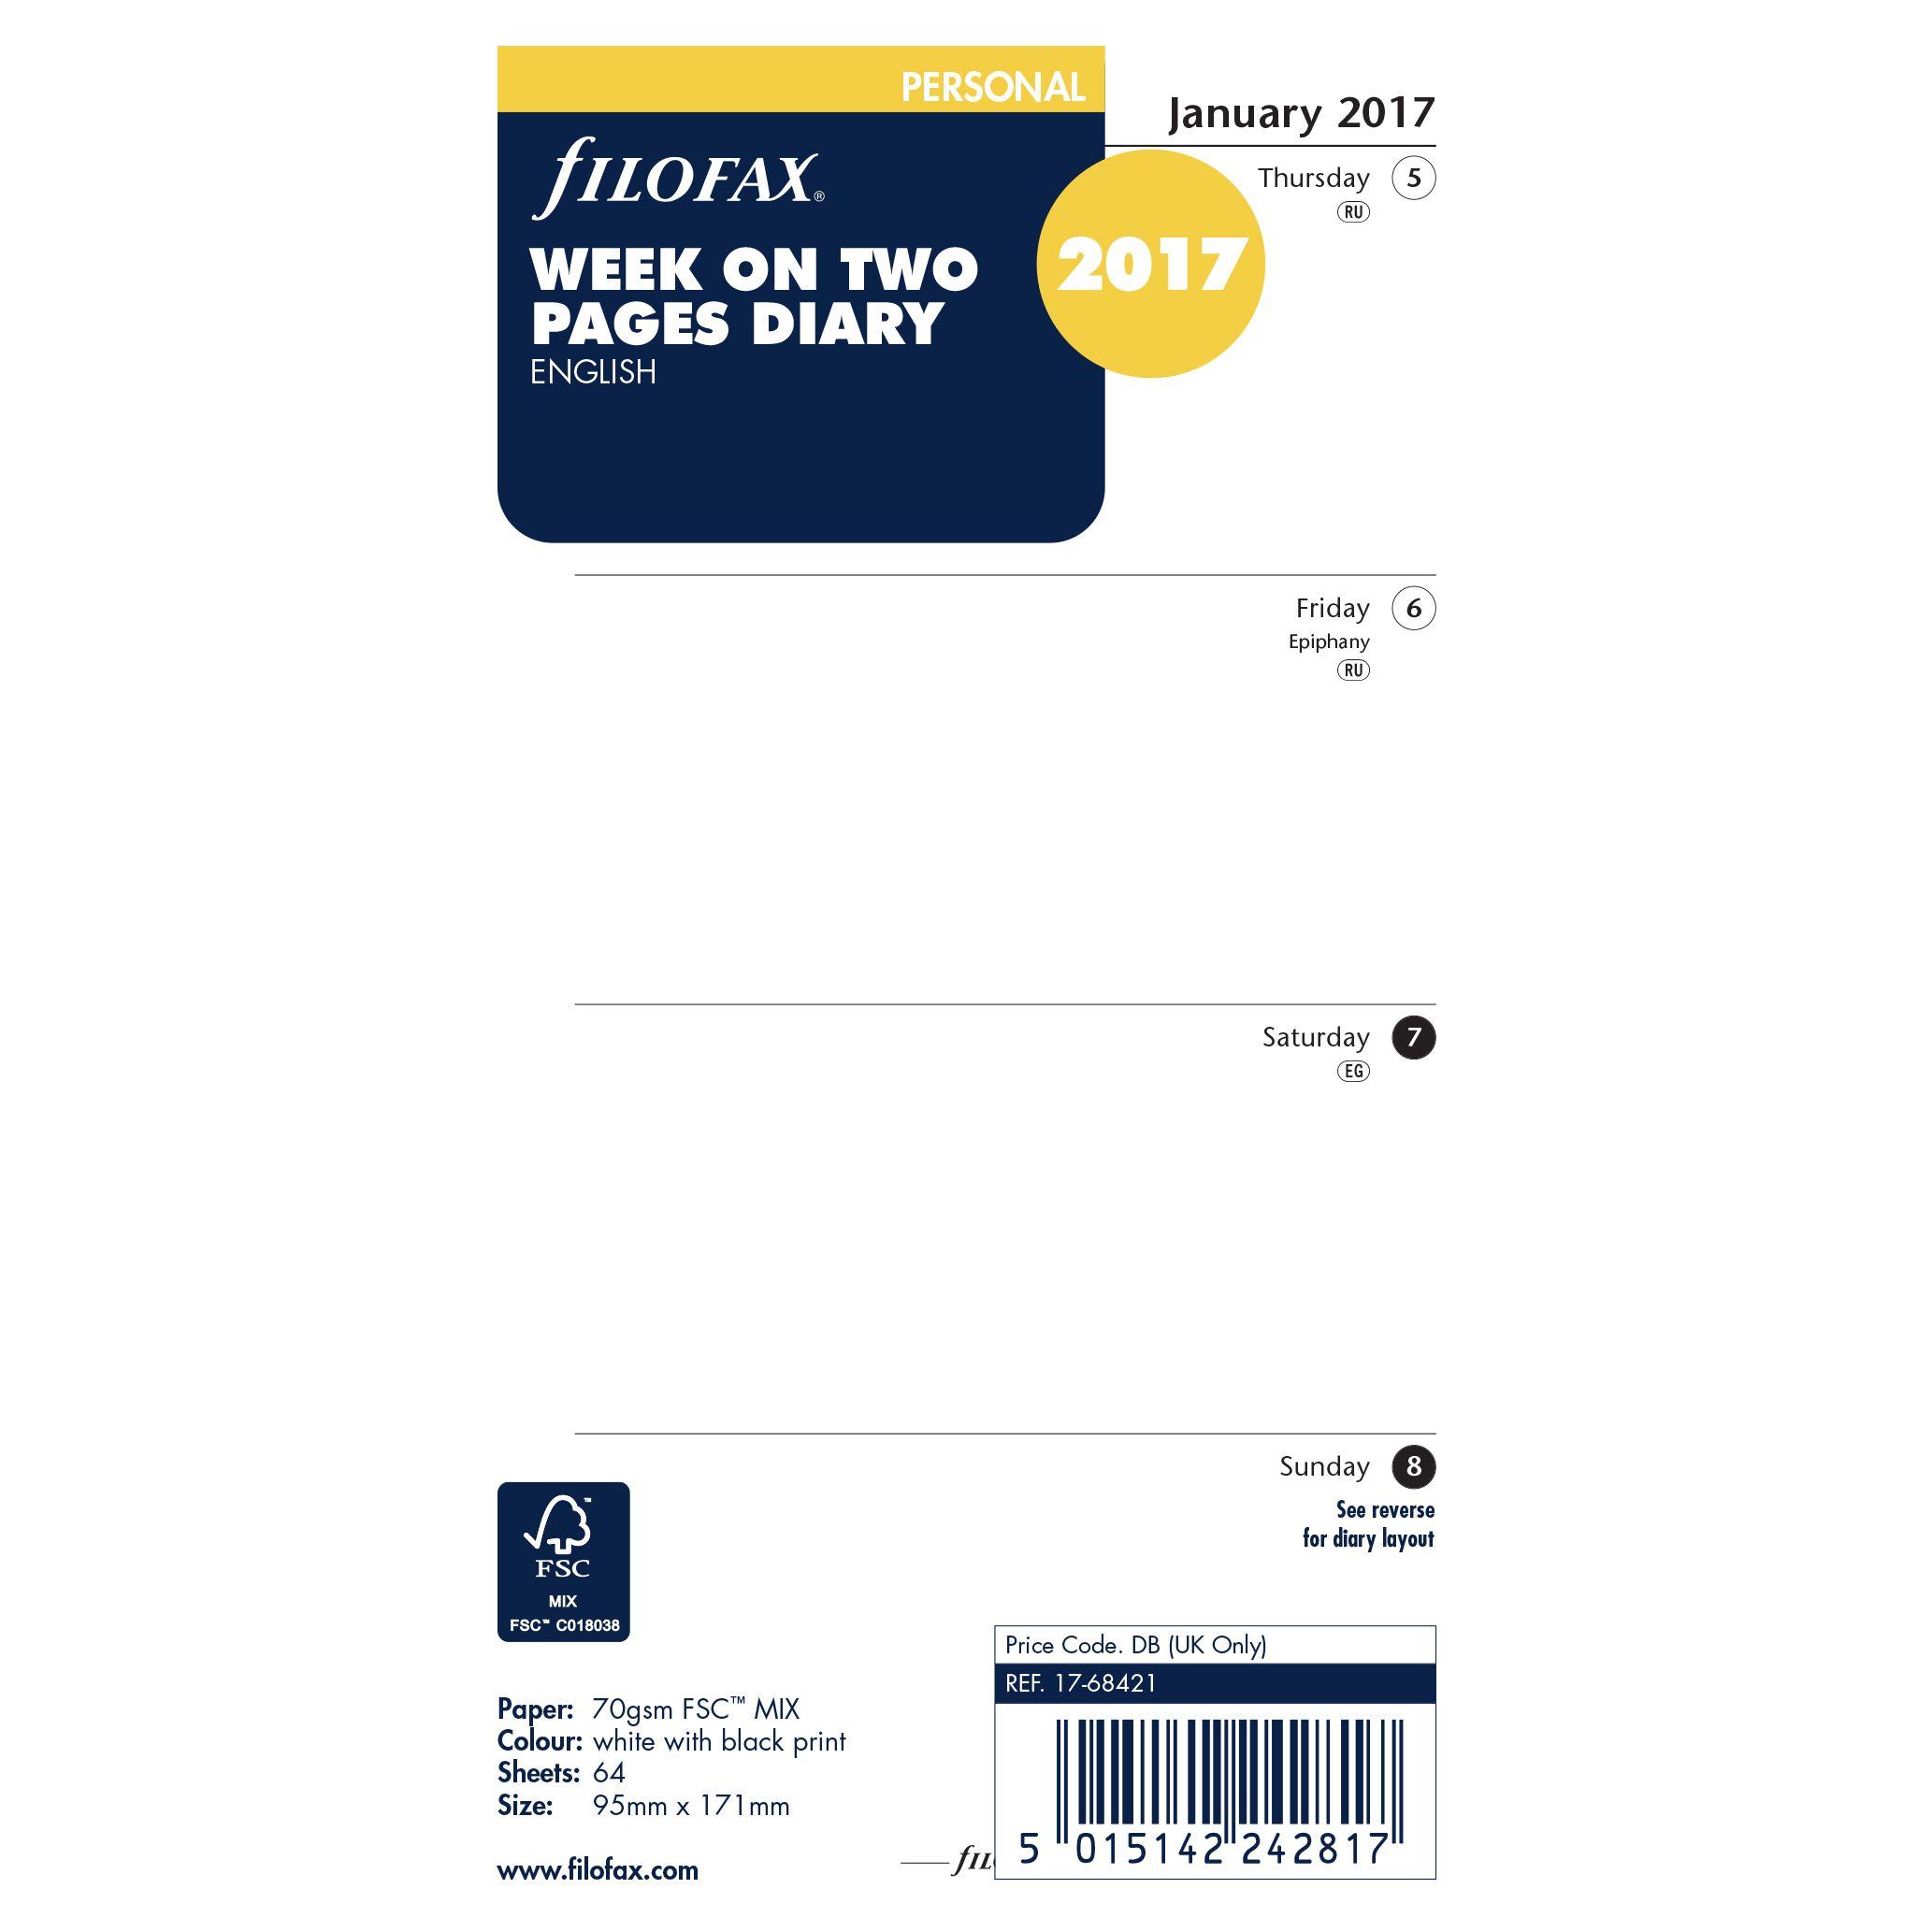 Filofax Filofax Week On 2 Pages 2017 Organiser Inserts, Personal